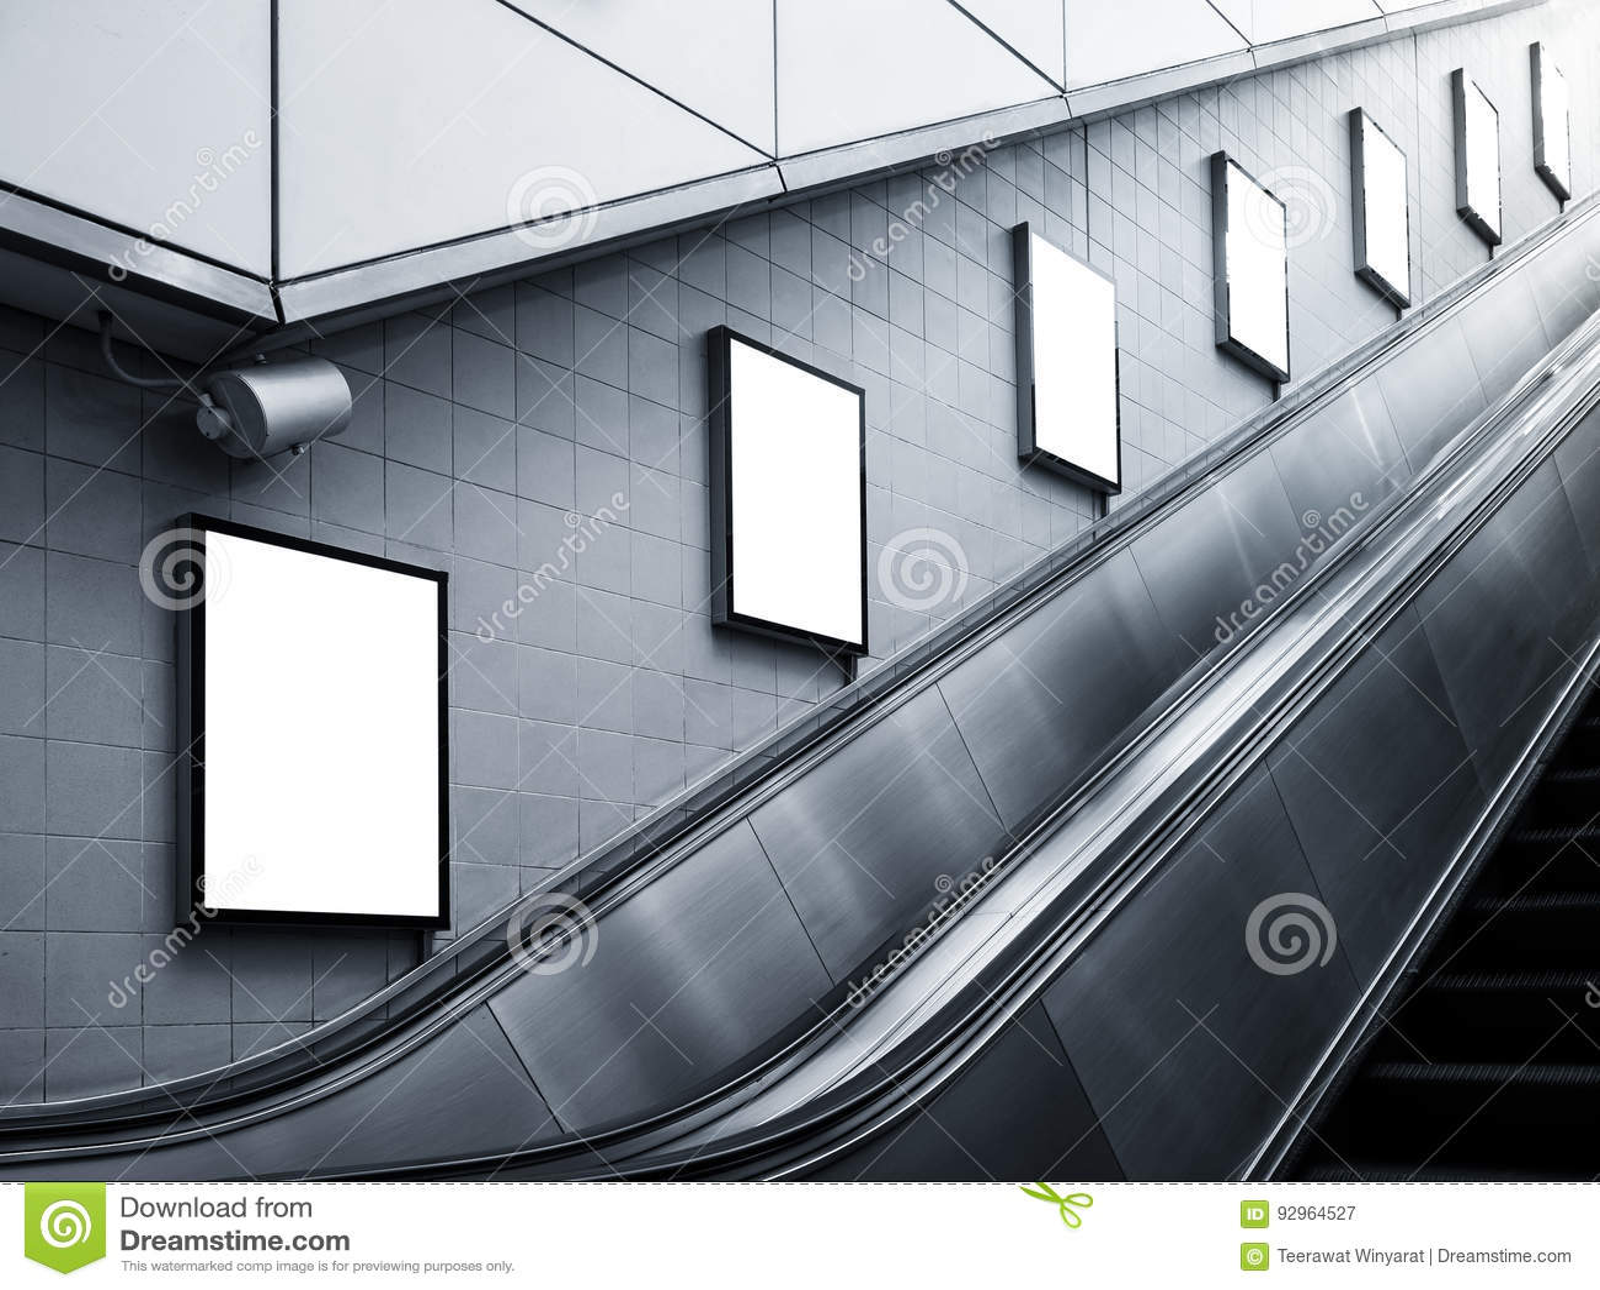 Mock Up Poster Media Ads Escalator Side Subway Station Stock Image